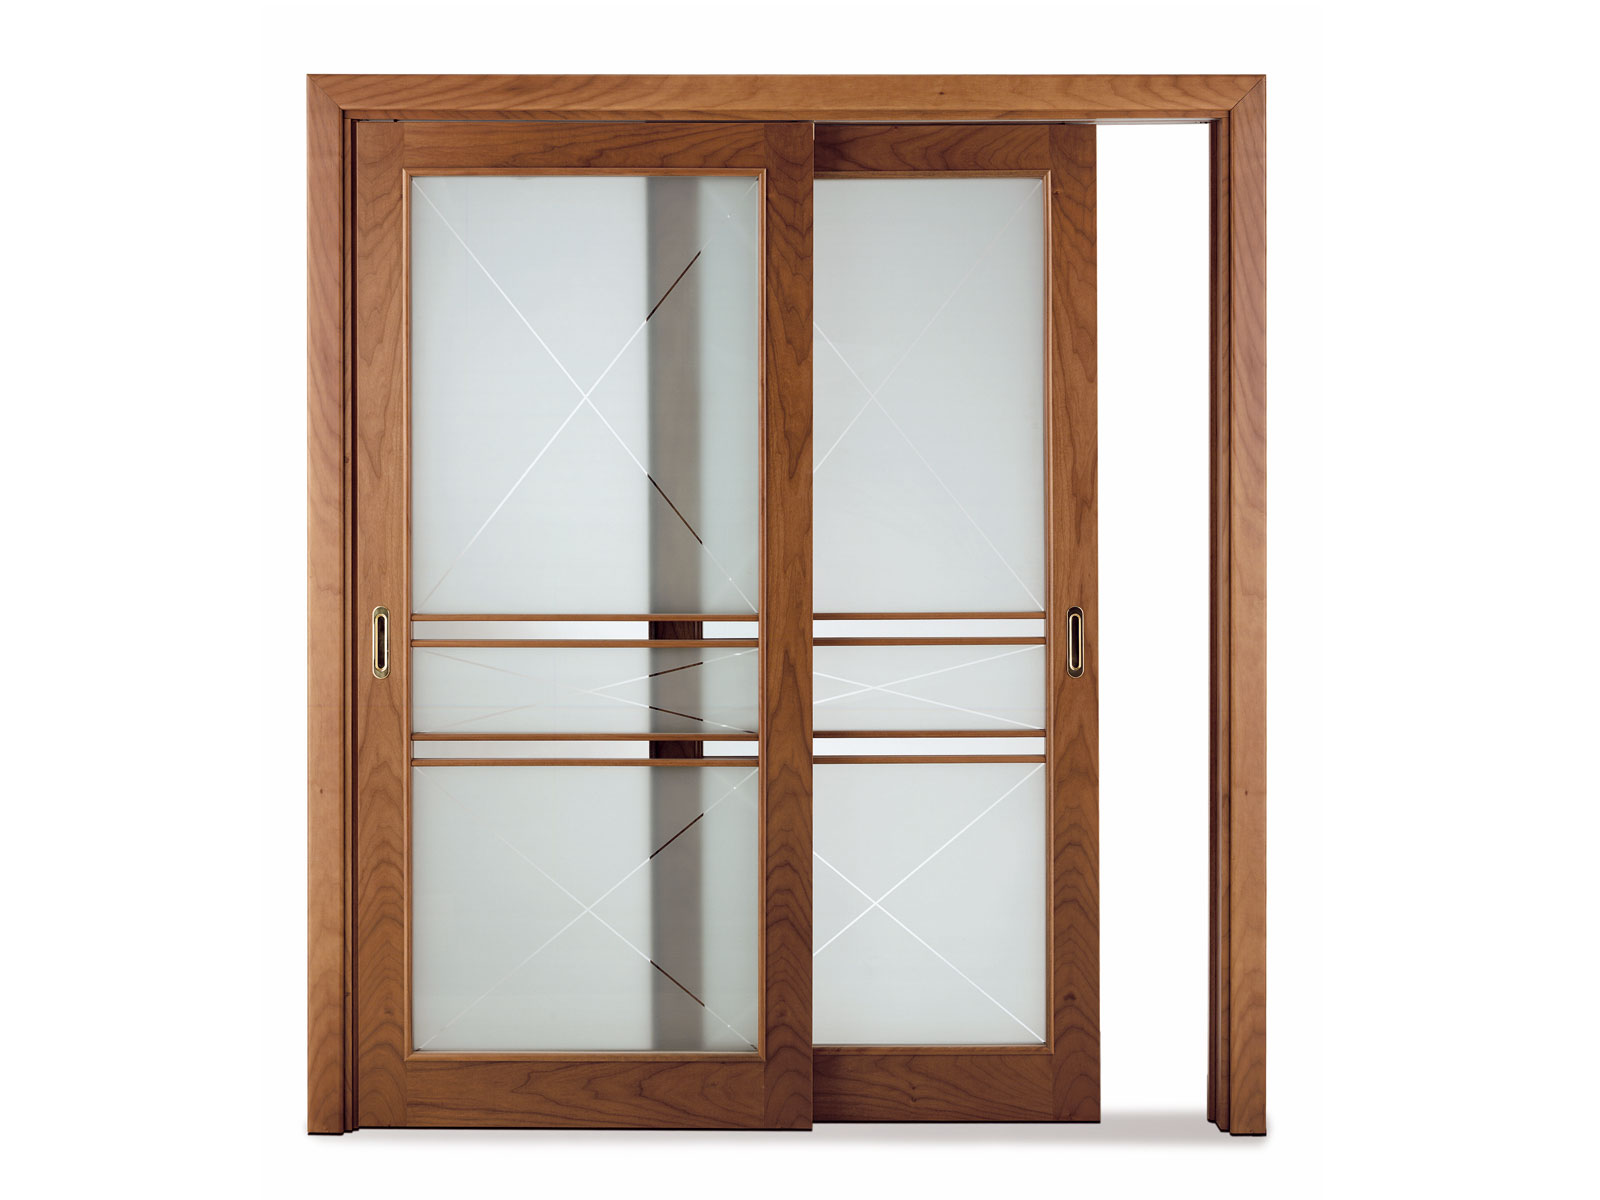 Puerta corrediza de vidrio dover by ghizzi benatti - Puerta corrediza de madera ...